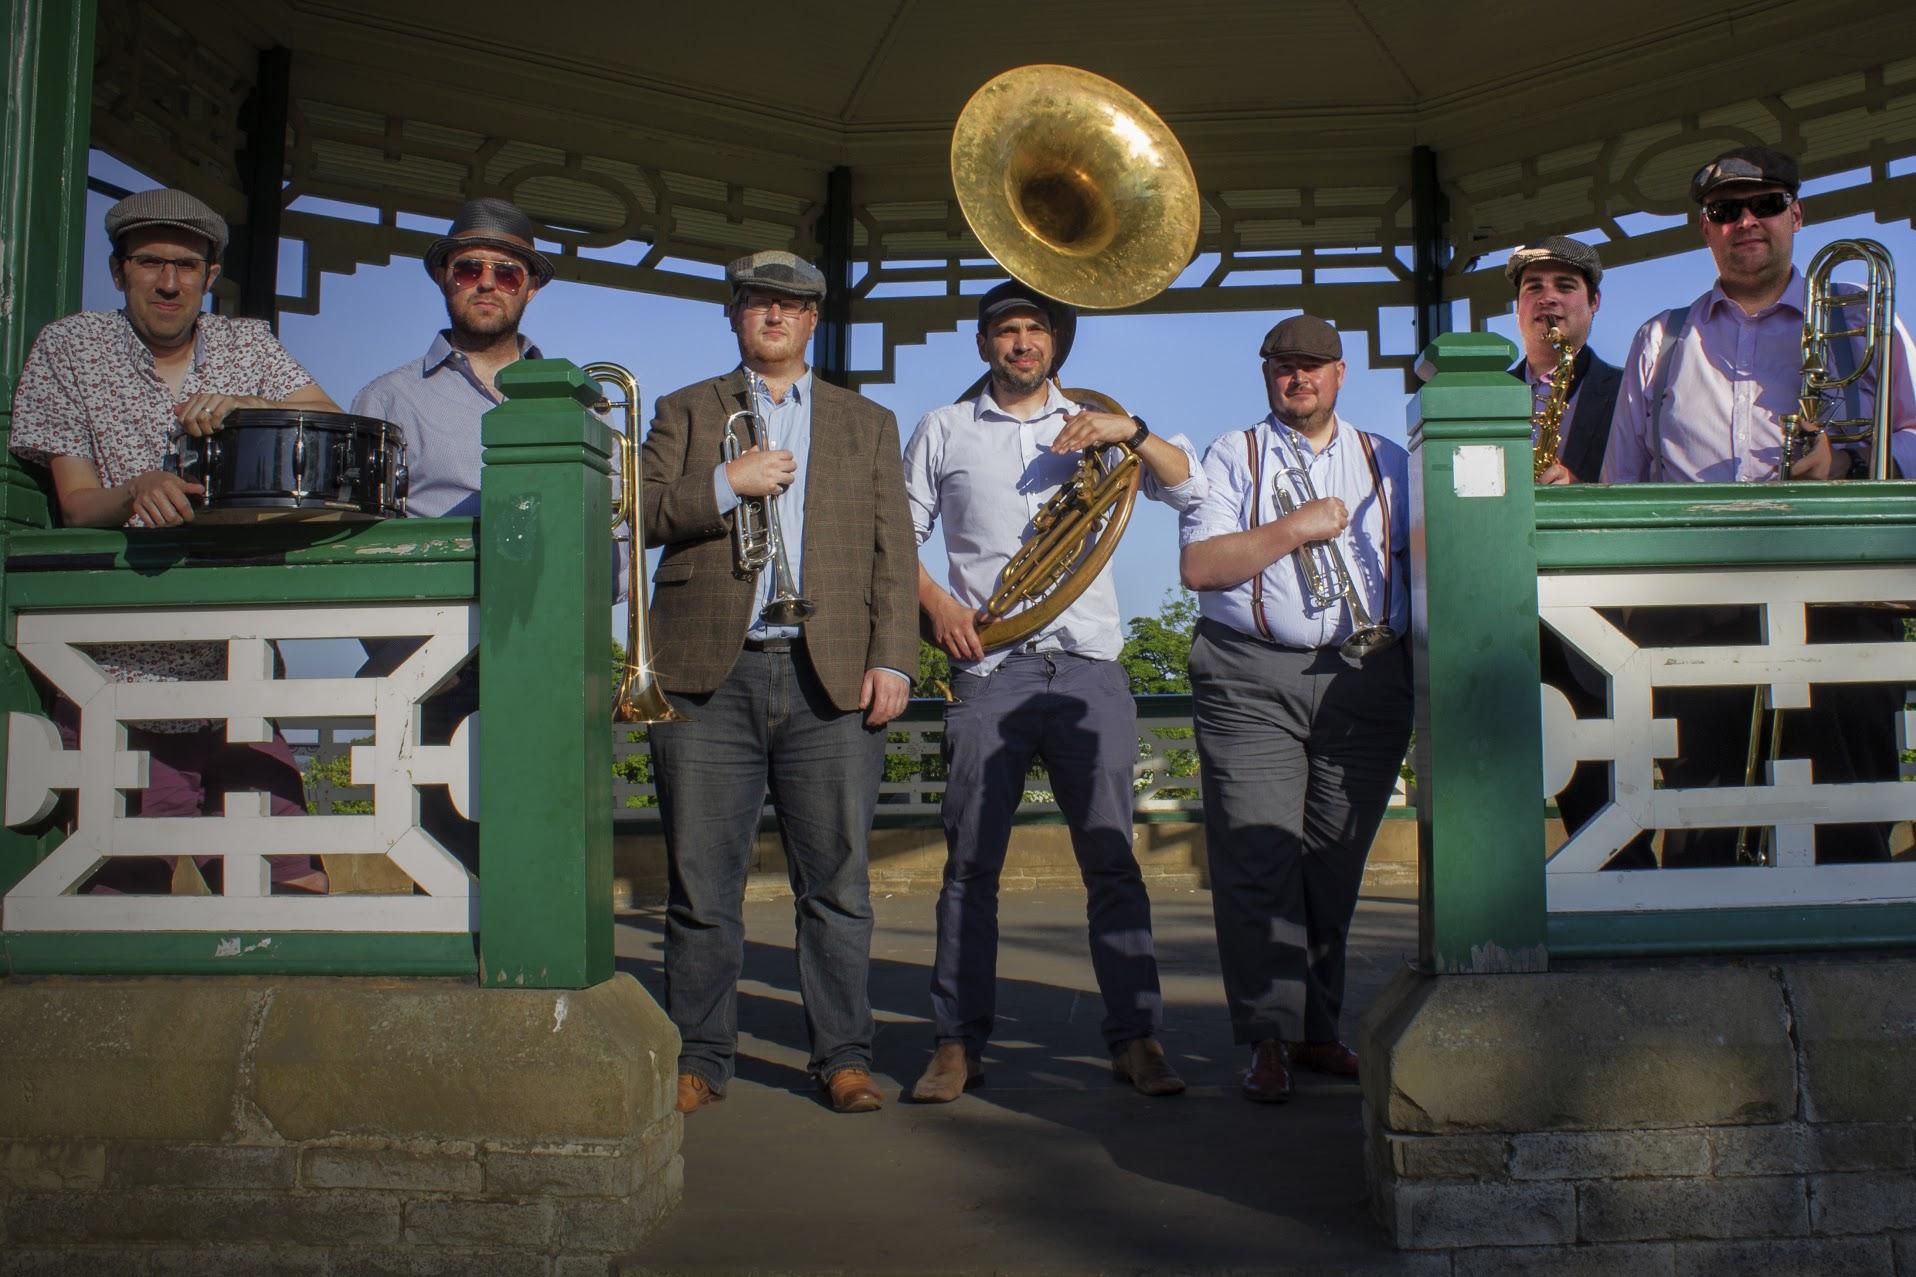 The Baker Boys Vintage Wedding Band